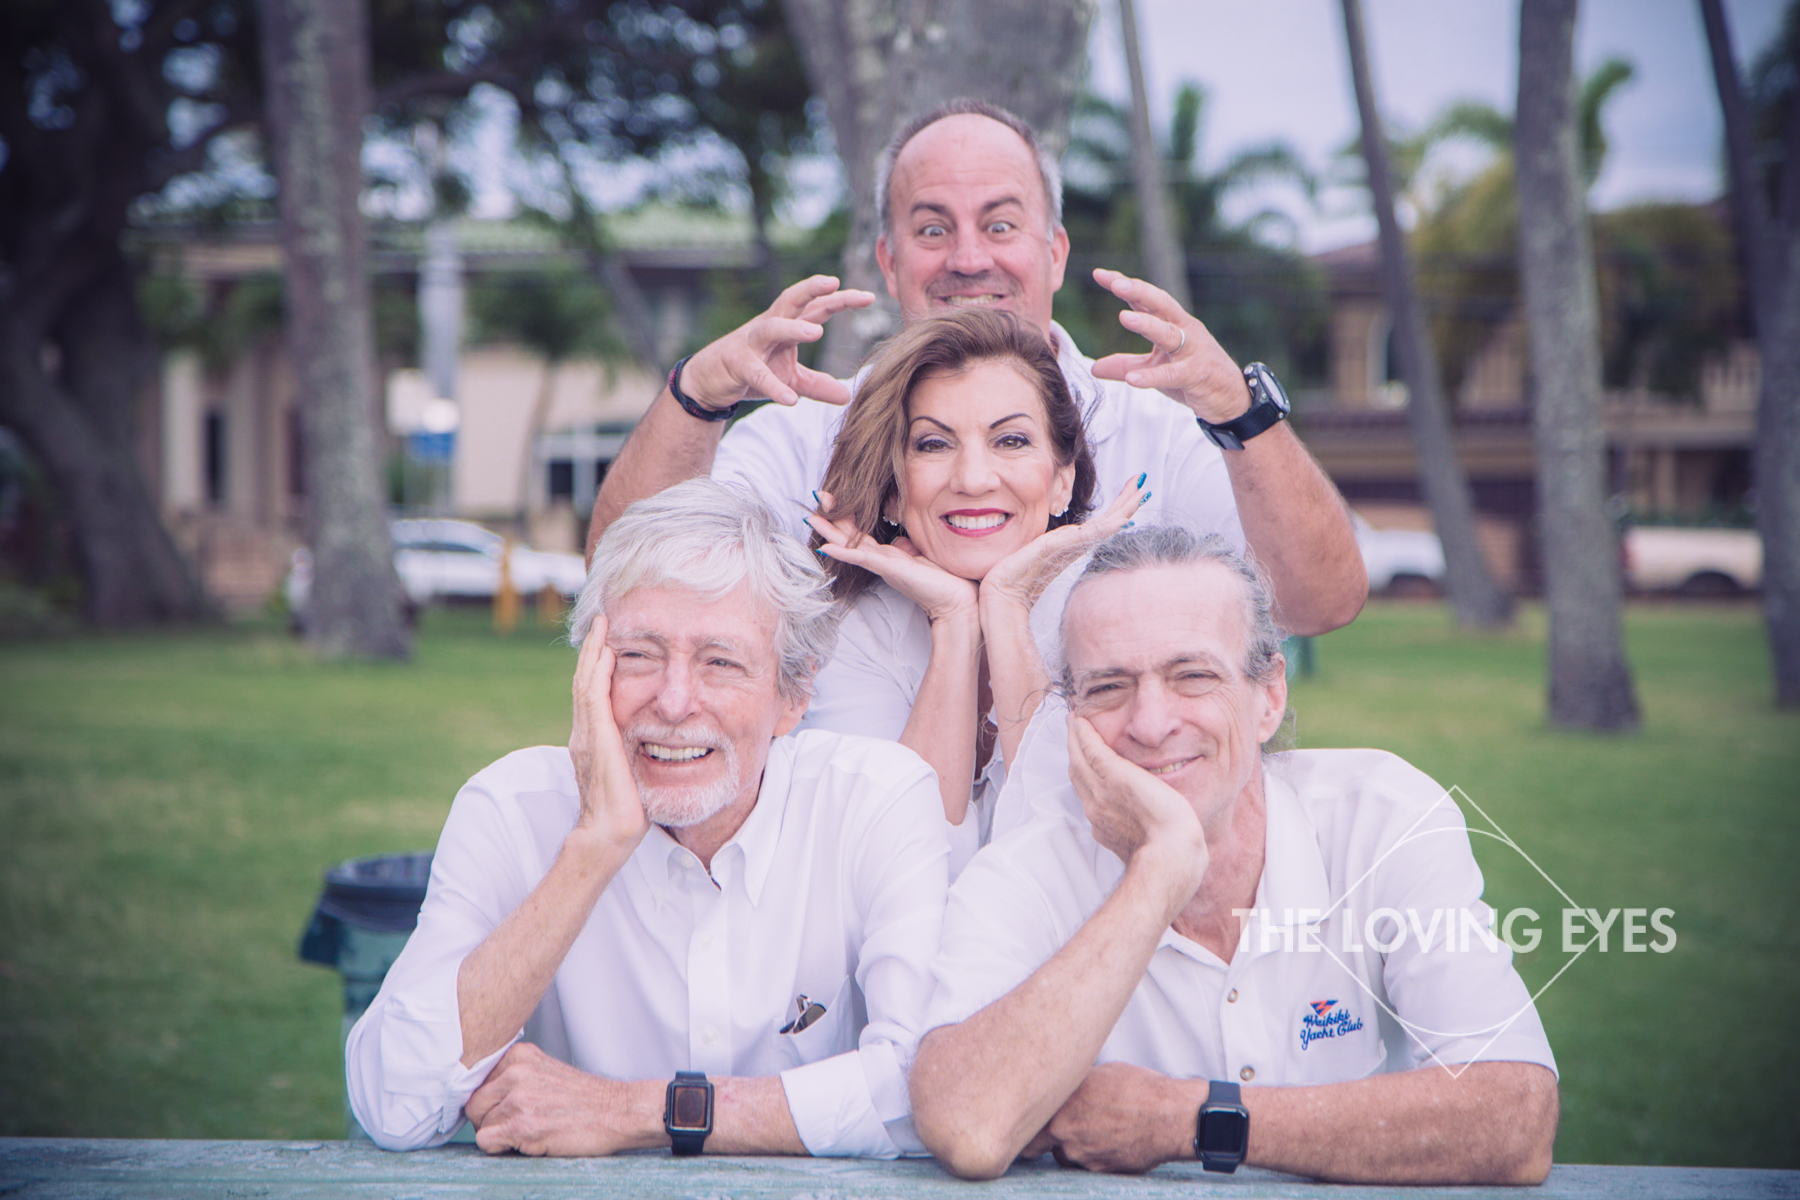 Fun family portrait on the beach in Hawaii